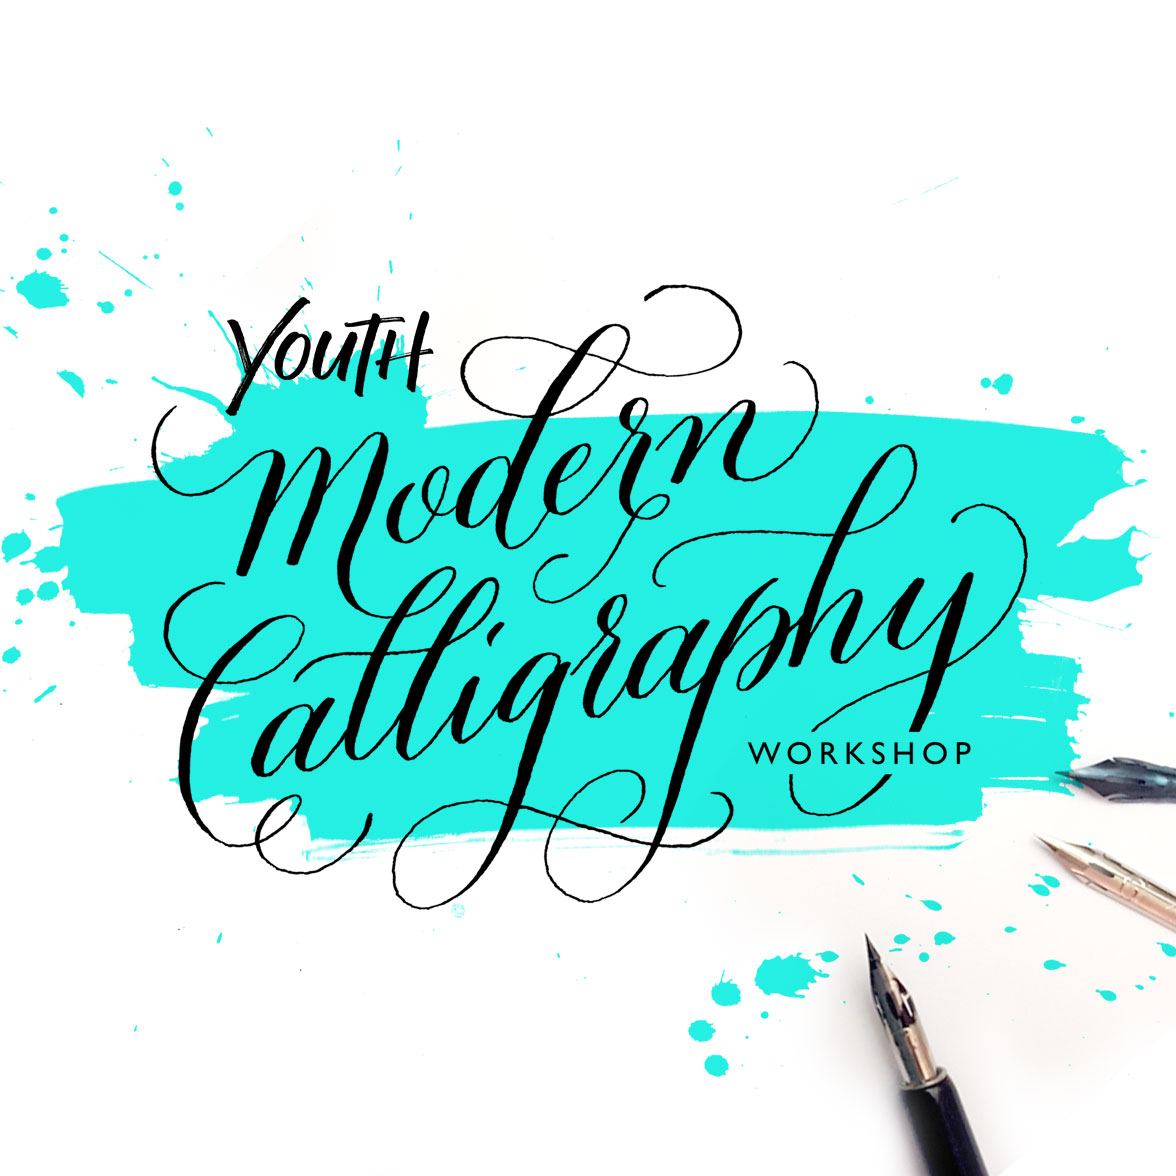 ModCal-Social-Media-Image_YouthSplat_square.jpg